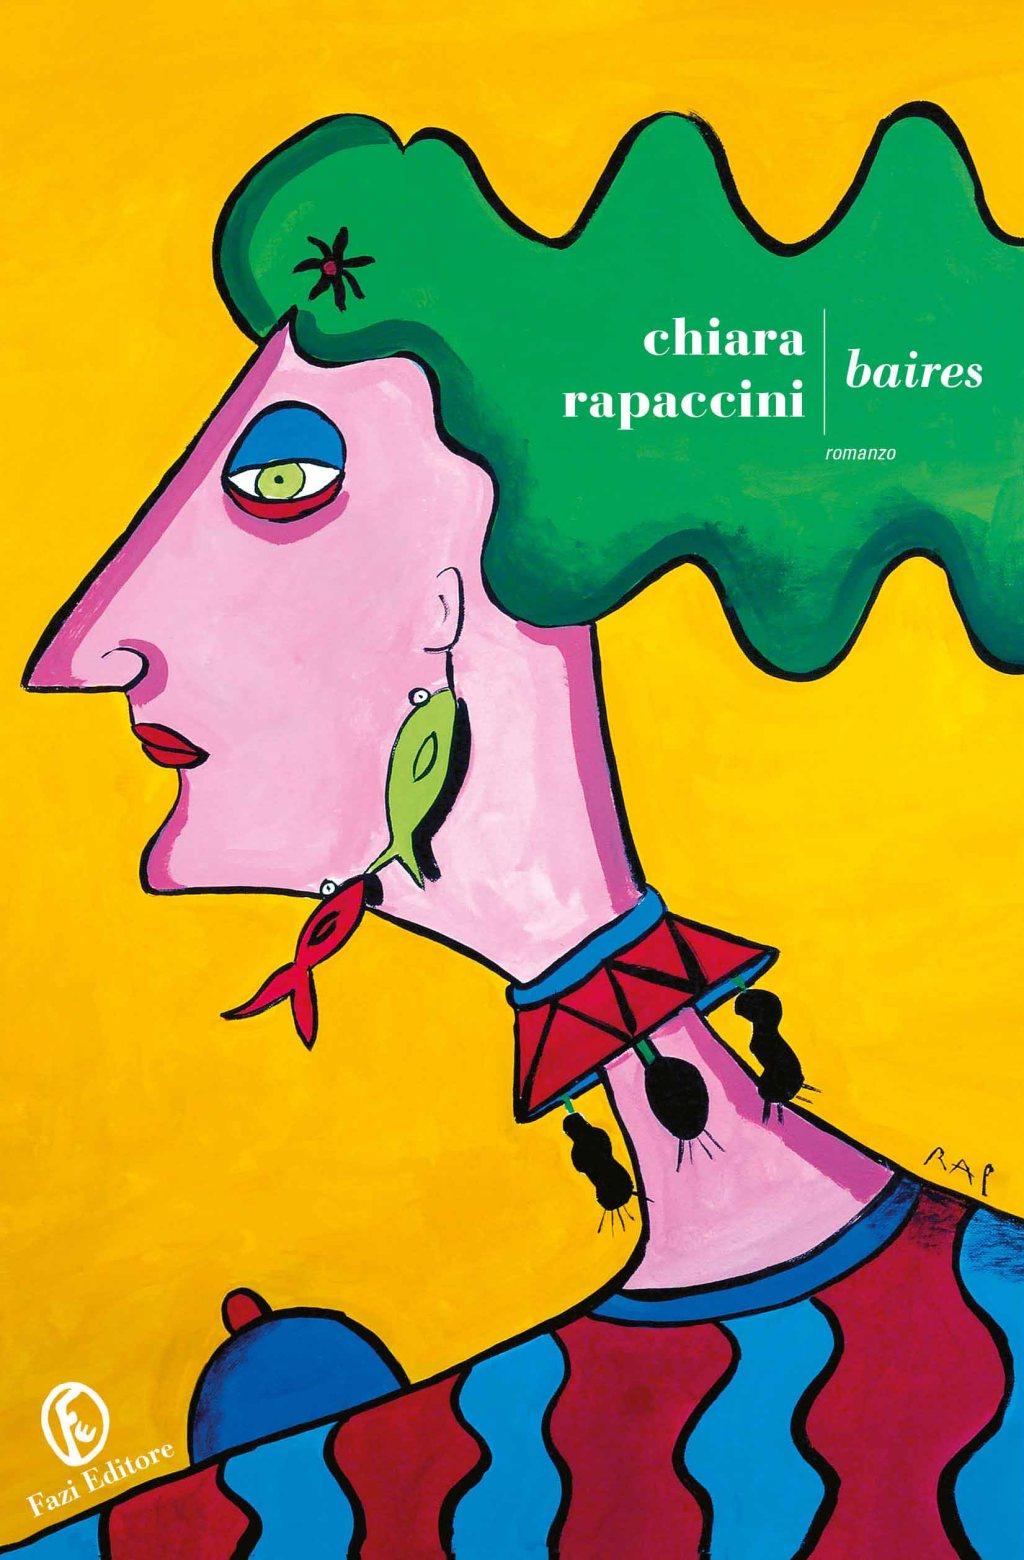 Chiara Rapaccini